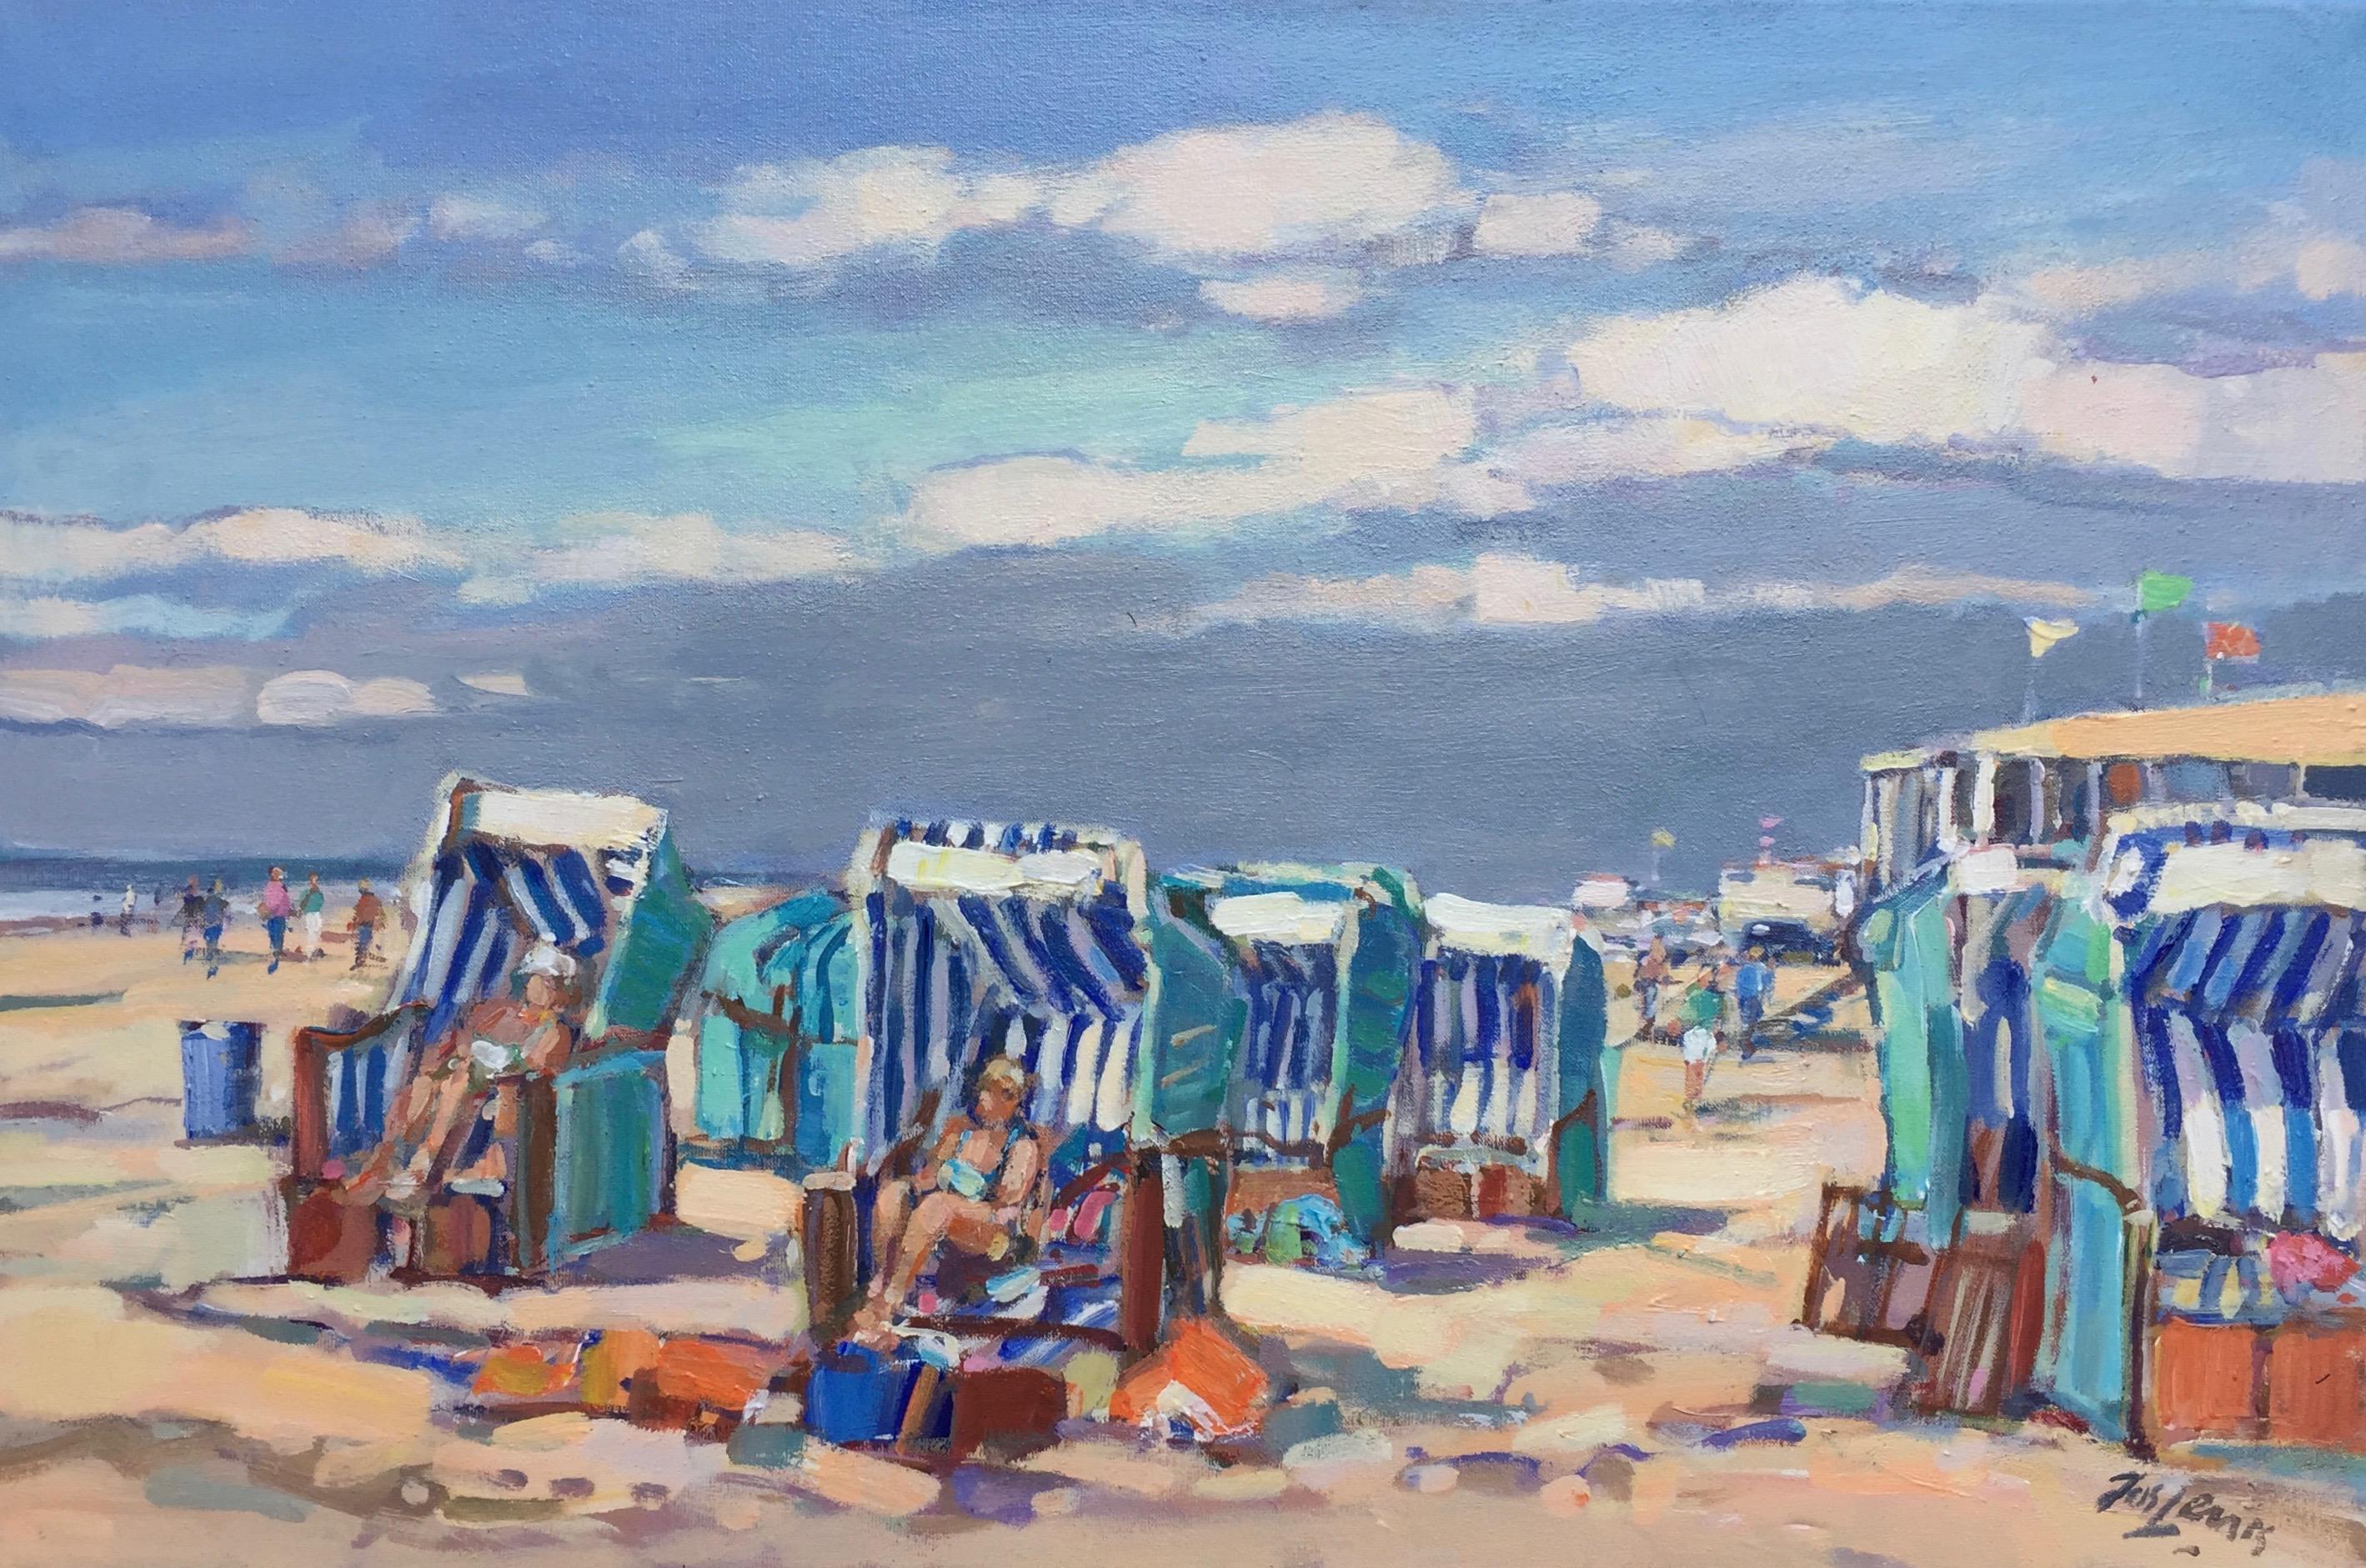 Beach Stables, Bergen- 21 st Century Dutch Impressionistic Plein Air Painting